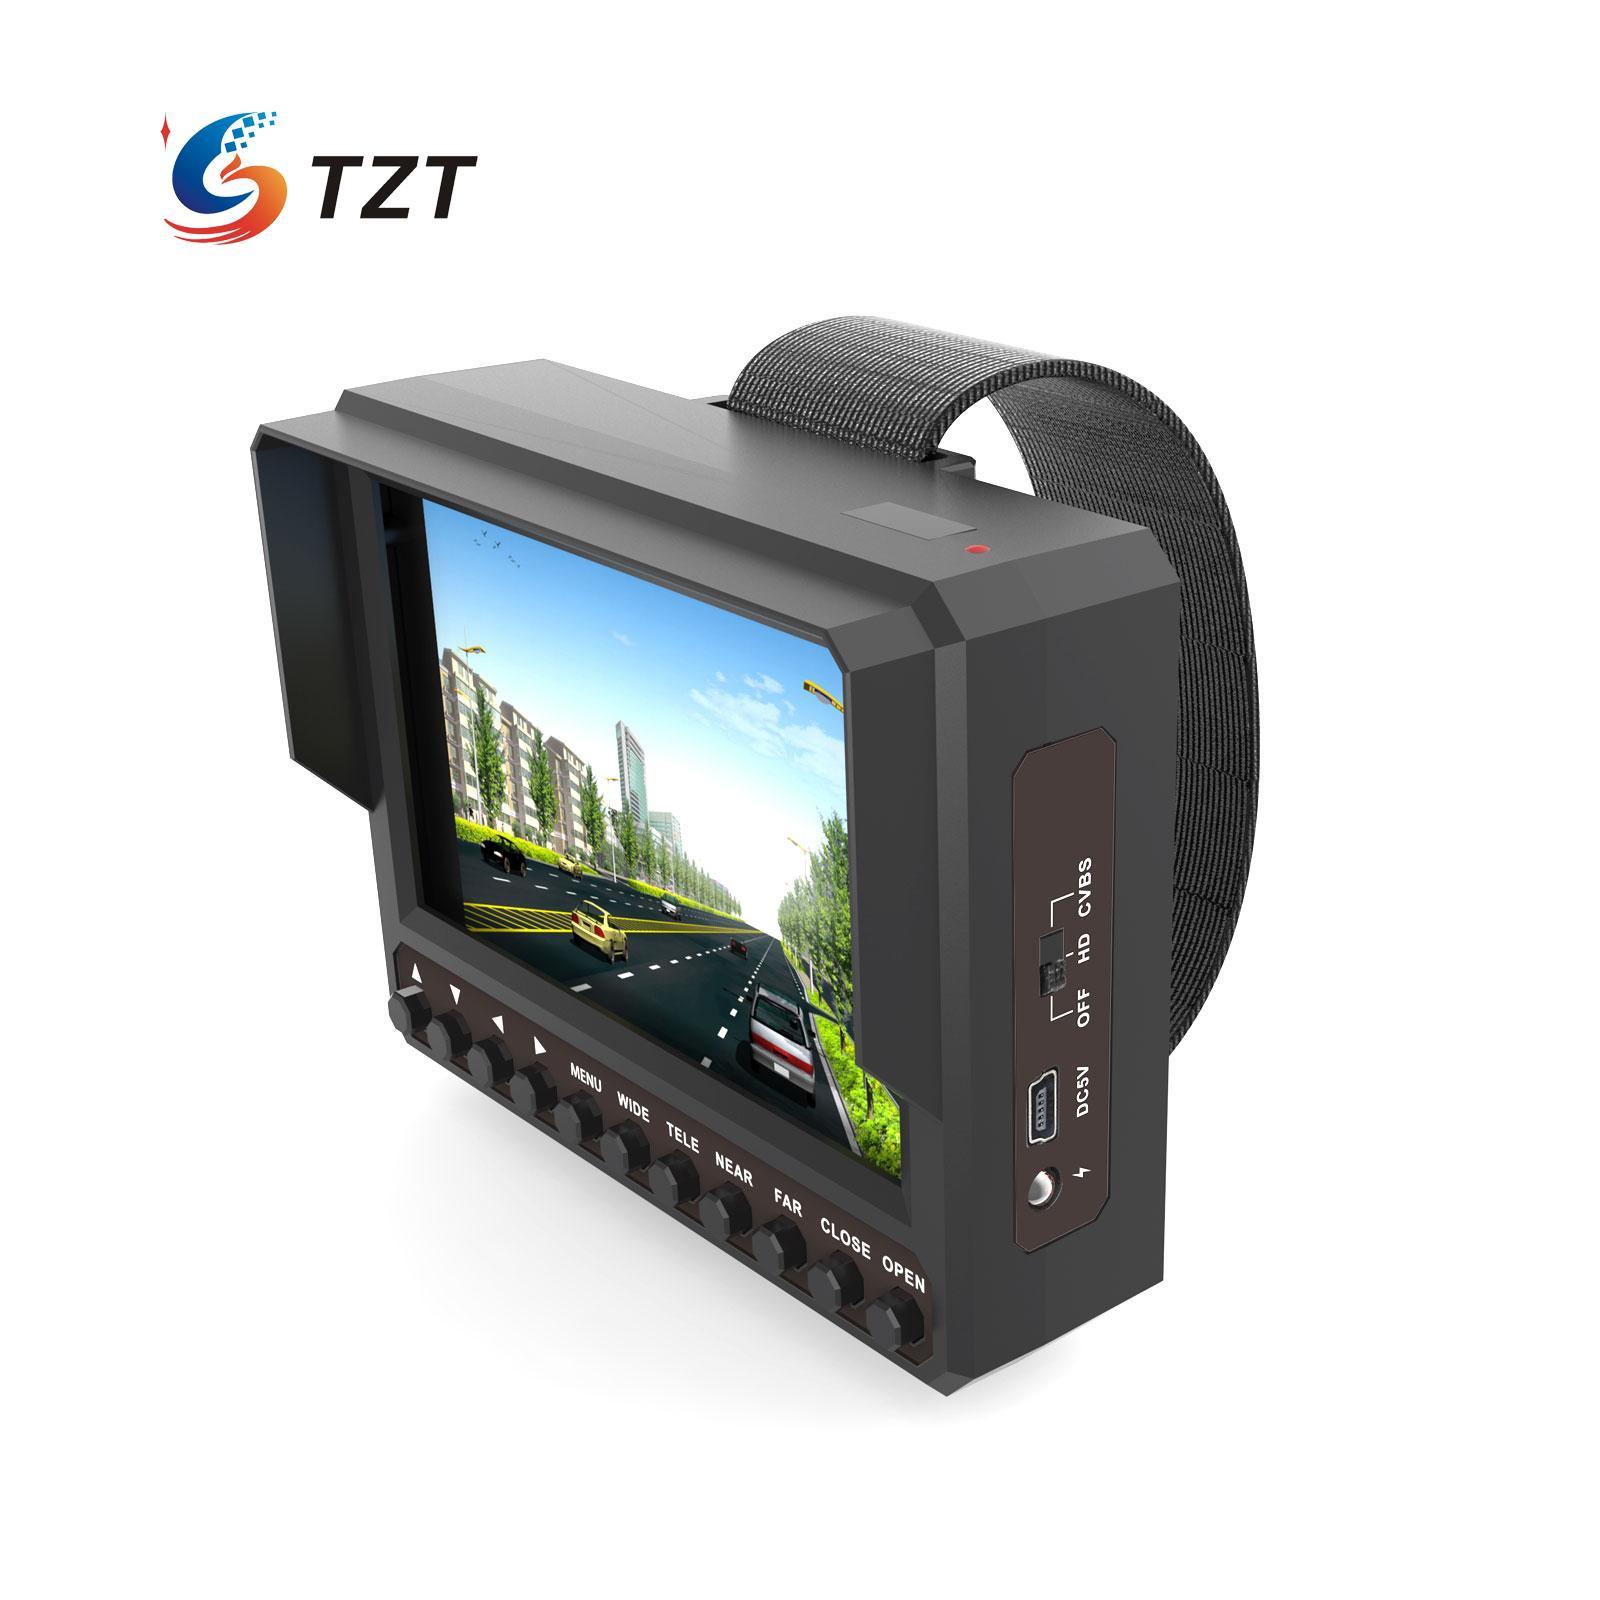 4.3 LCD V5.4 AHD2.0 TVI3.0 HD TVI2.0 CVI2.0 TVI AT430TAC HD Security Tester lp116wh2 m116nwr1 ltn116at02 n116bge lb1 b116xw03 v 0 n116bge l41 n116bge lb1 ltn116at04 claa116wa03a b116xw01slim lcd